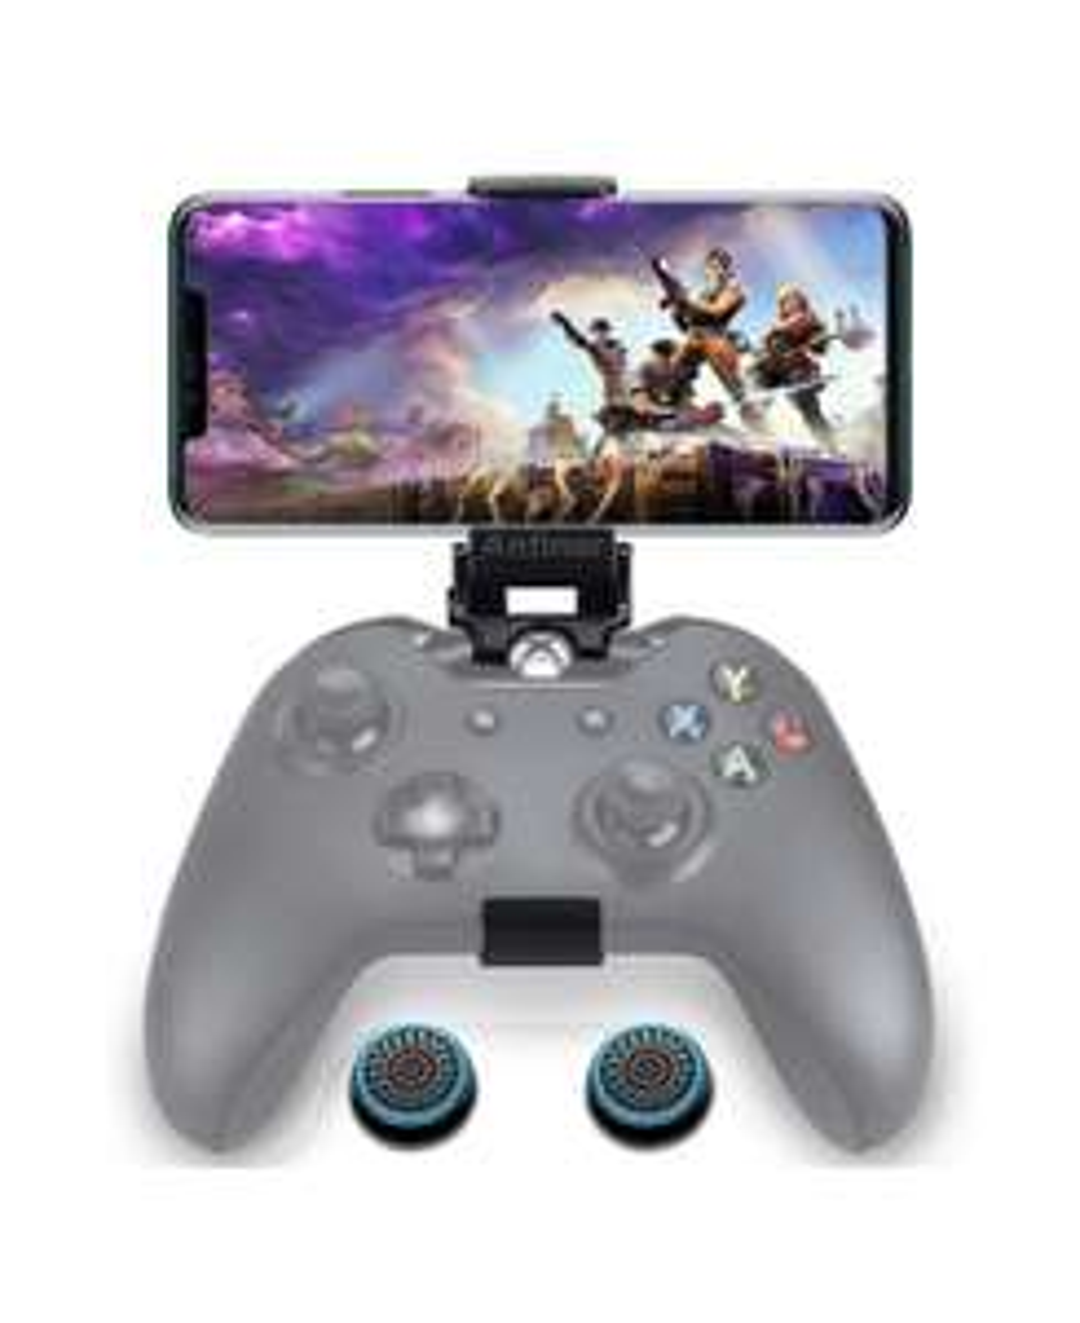 Amazon: Anfiner - Soporte para teléfono celular compatible con Microsoft Xbox One/Xbox One S/Xbox One X